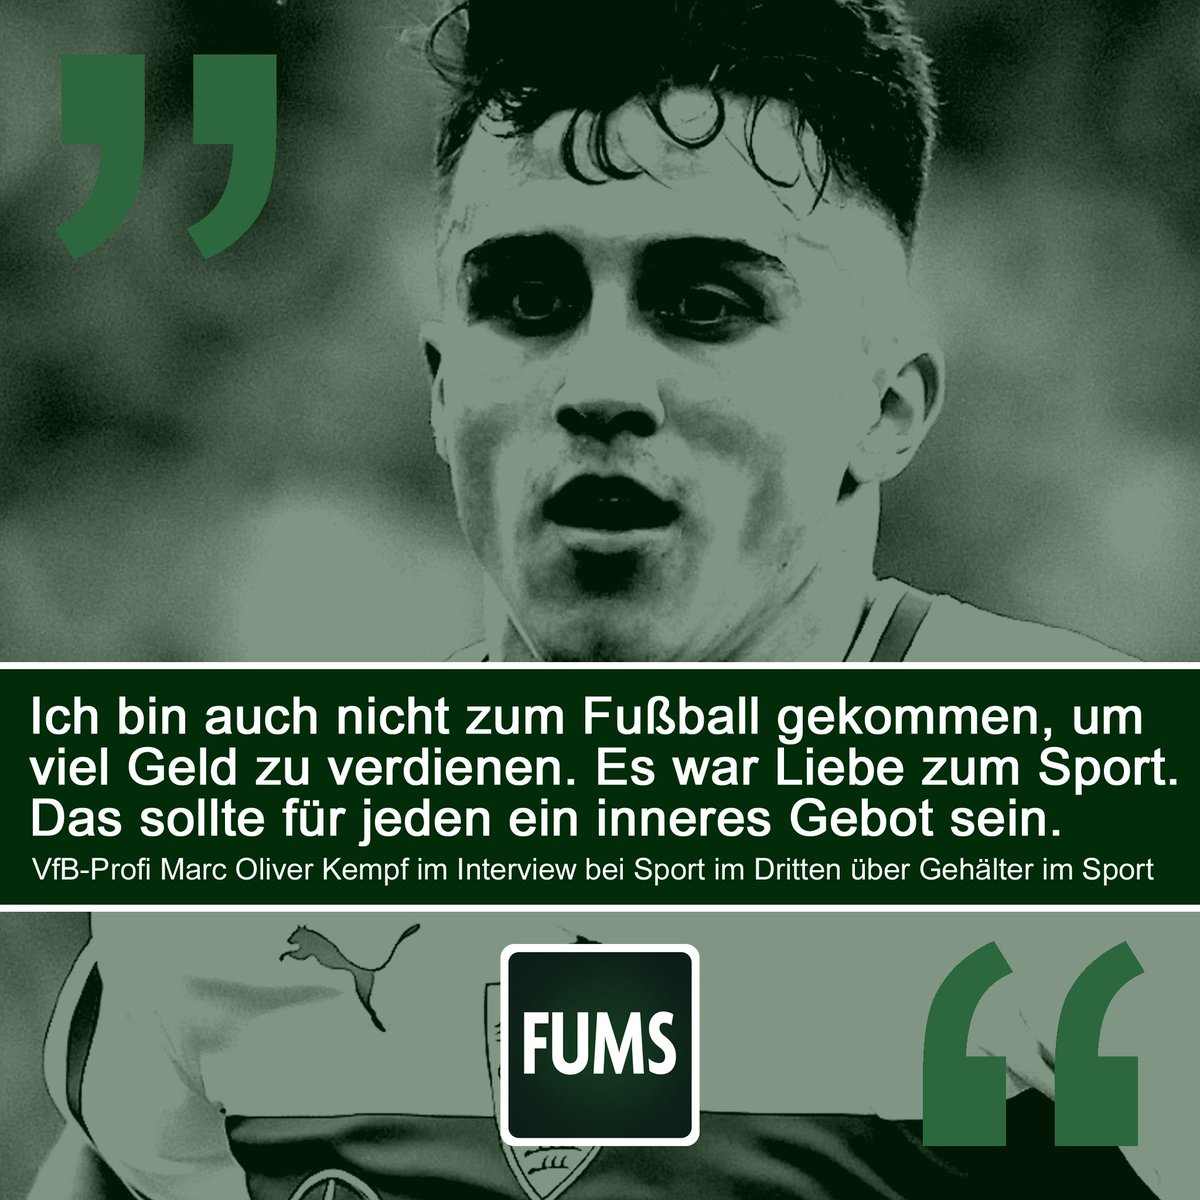 RT @fums_magazin: Liebe zum Sport ❤️ #Kempf #VfB   ___ Football is life: @fums_magazin https://t.co/O12YWUjr2u